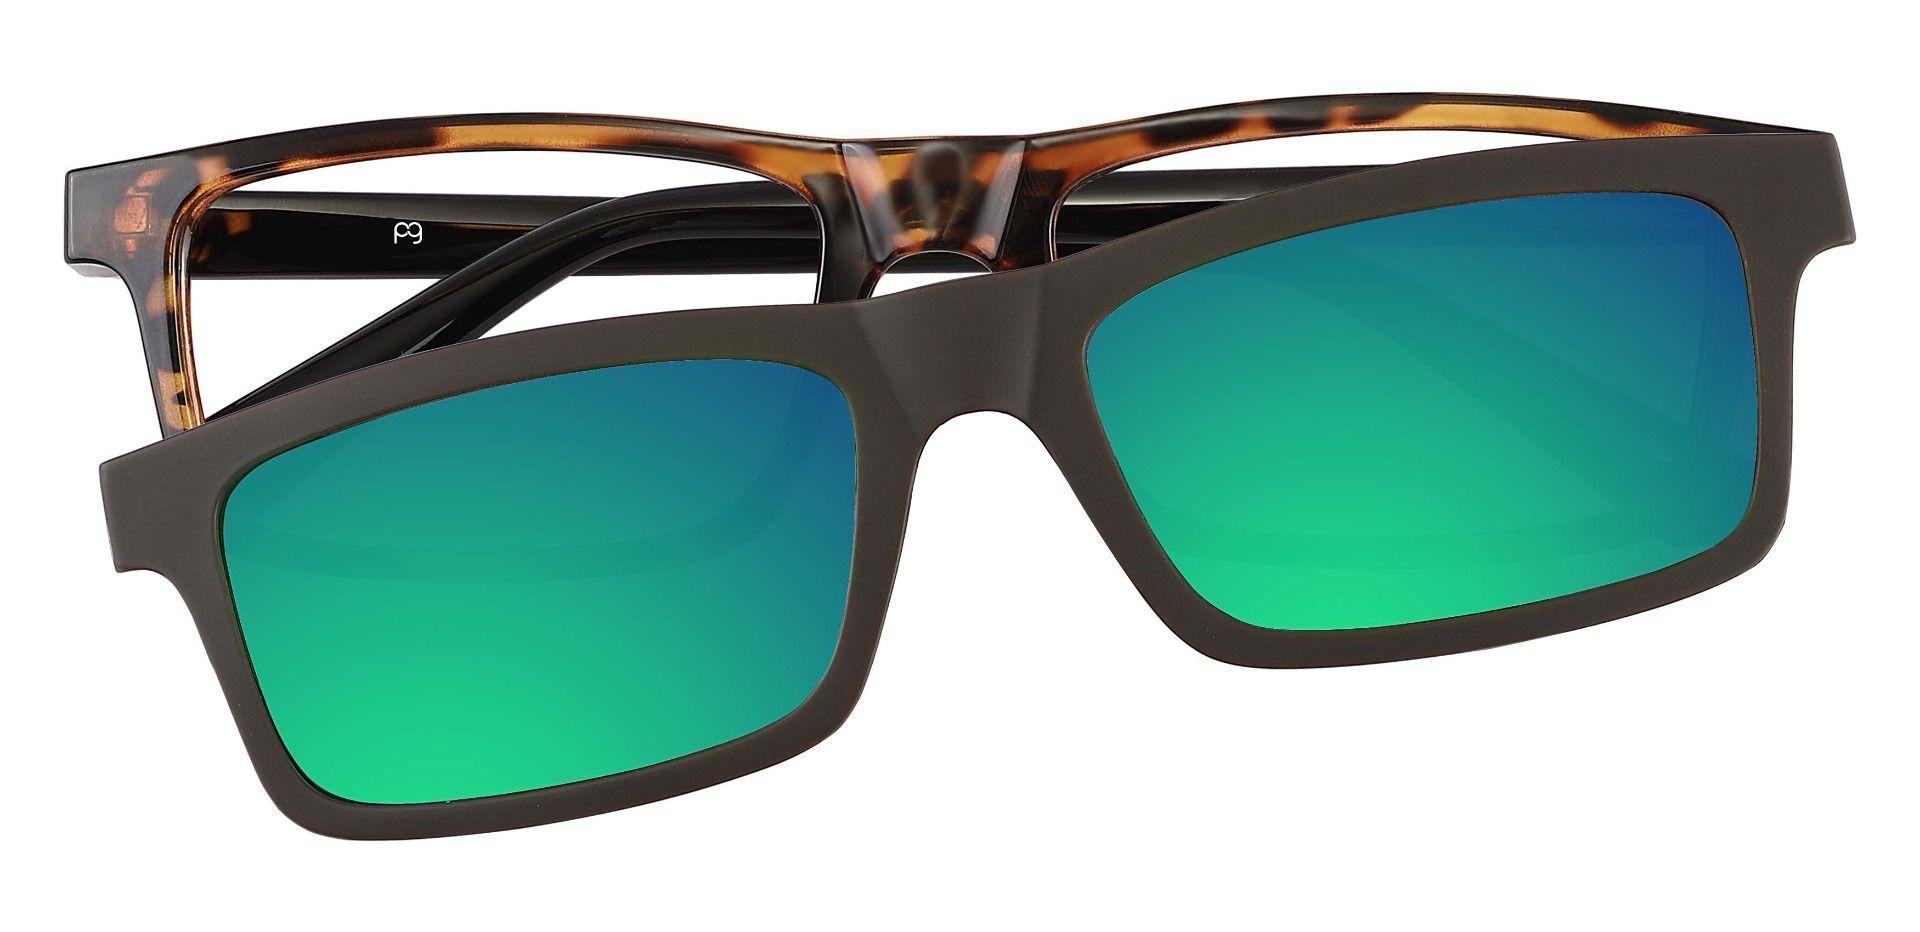 Inman Rectangle Eyeglasses Frame - Tortoise